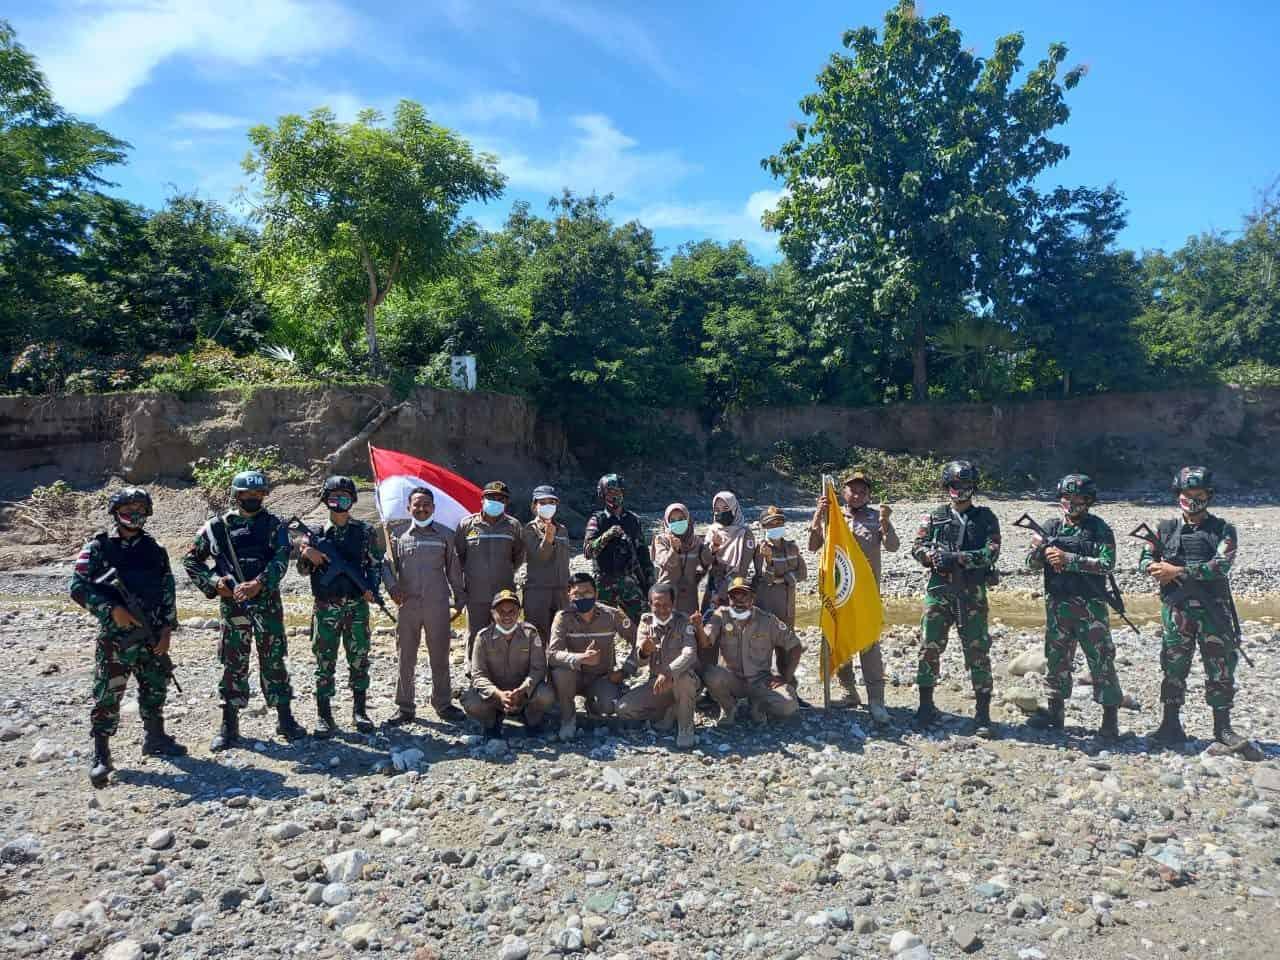 Cegah Kegiatan Ilegal, Satgas Yonif 742 Gelar Patroli Bersama di Perbatasan RI-RDTL